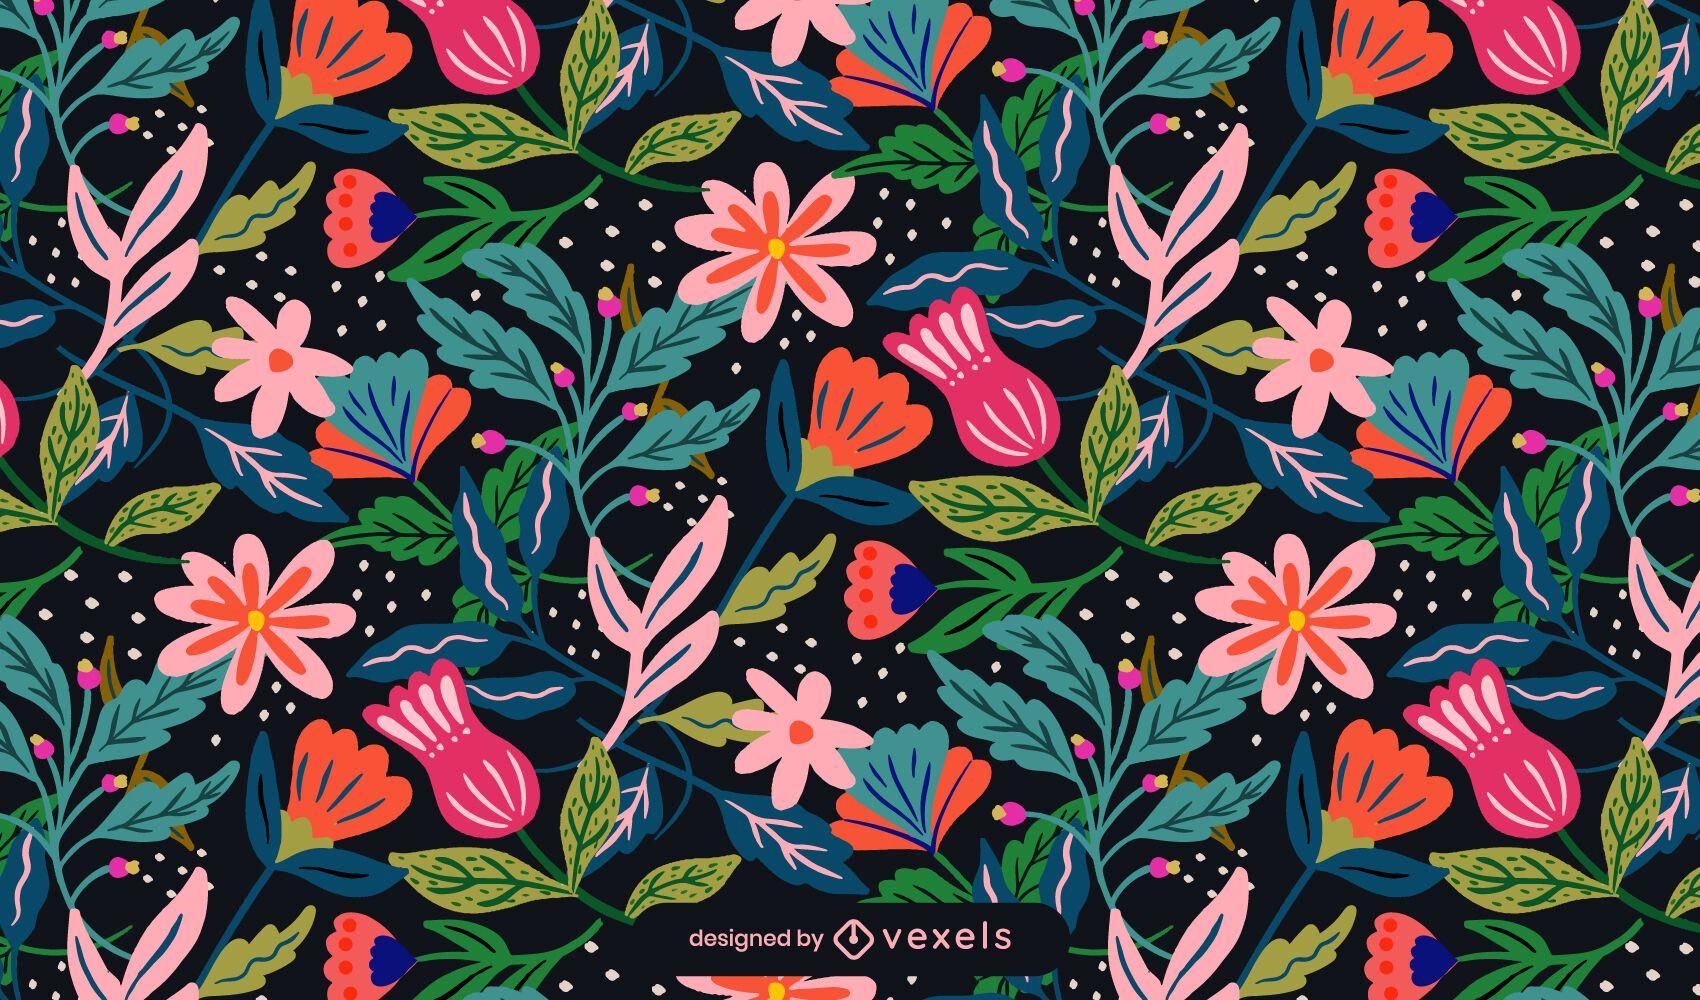 Flowers spring pattern design